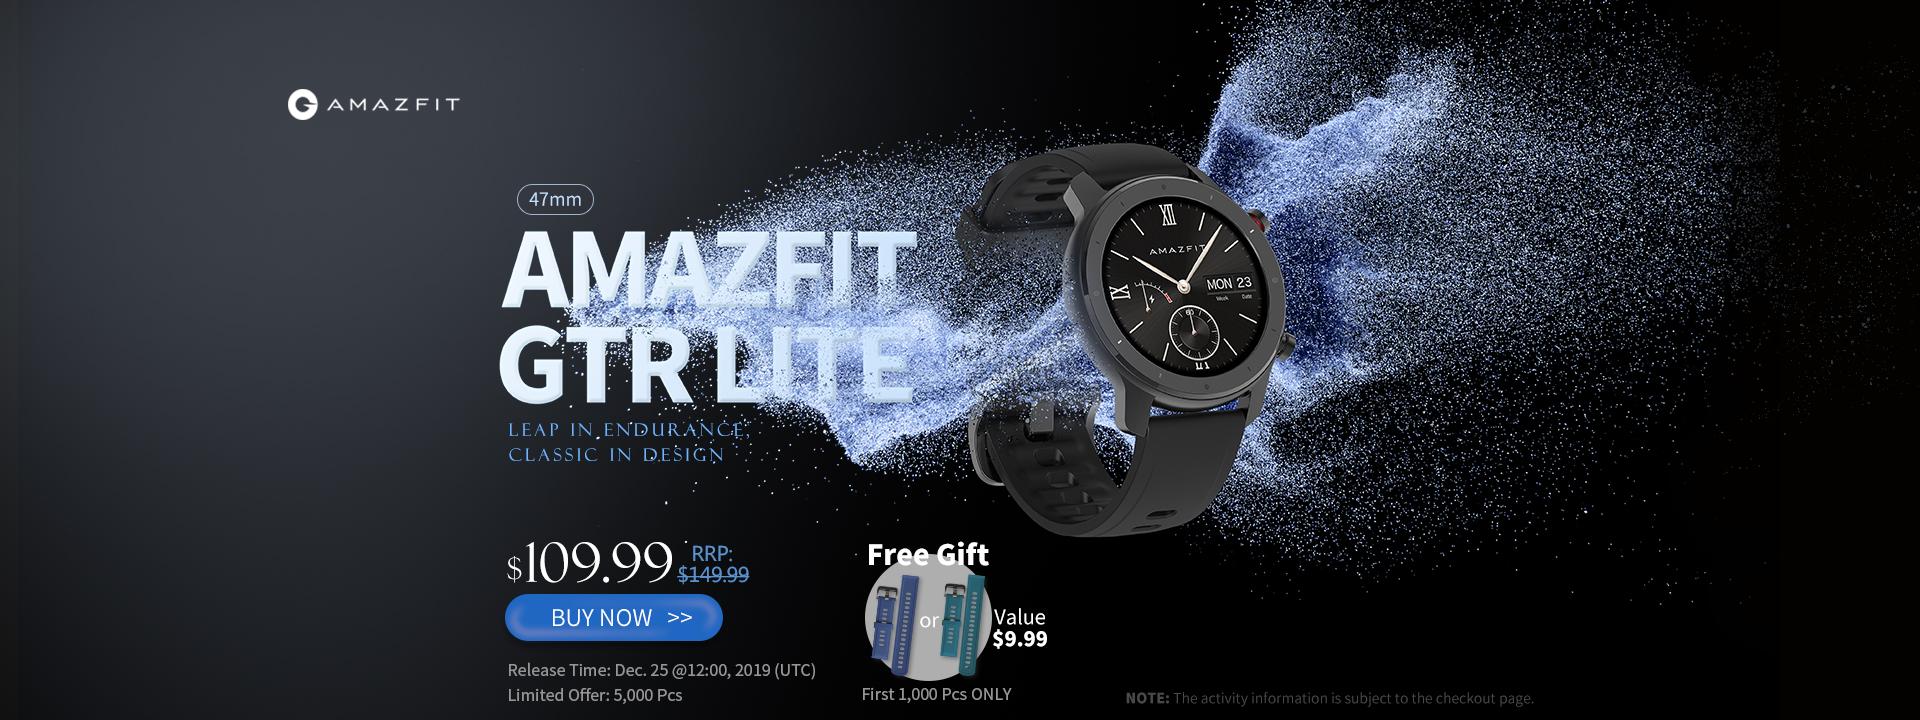 Nové hodinky Amazafit GTR Lite a Kospet Prime SE v akci [sponzorovaný článek]